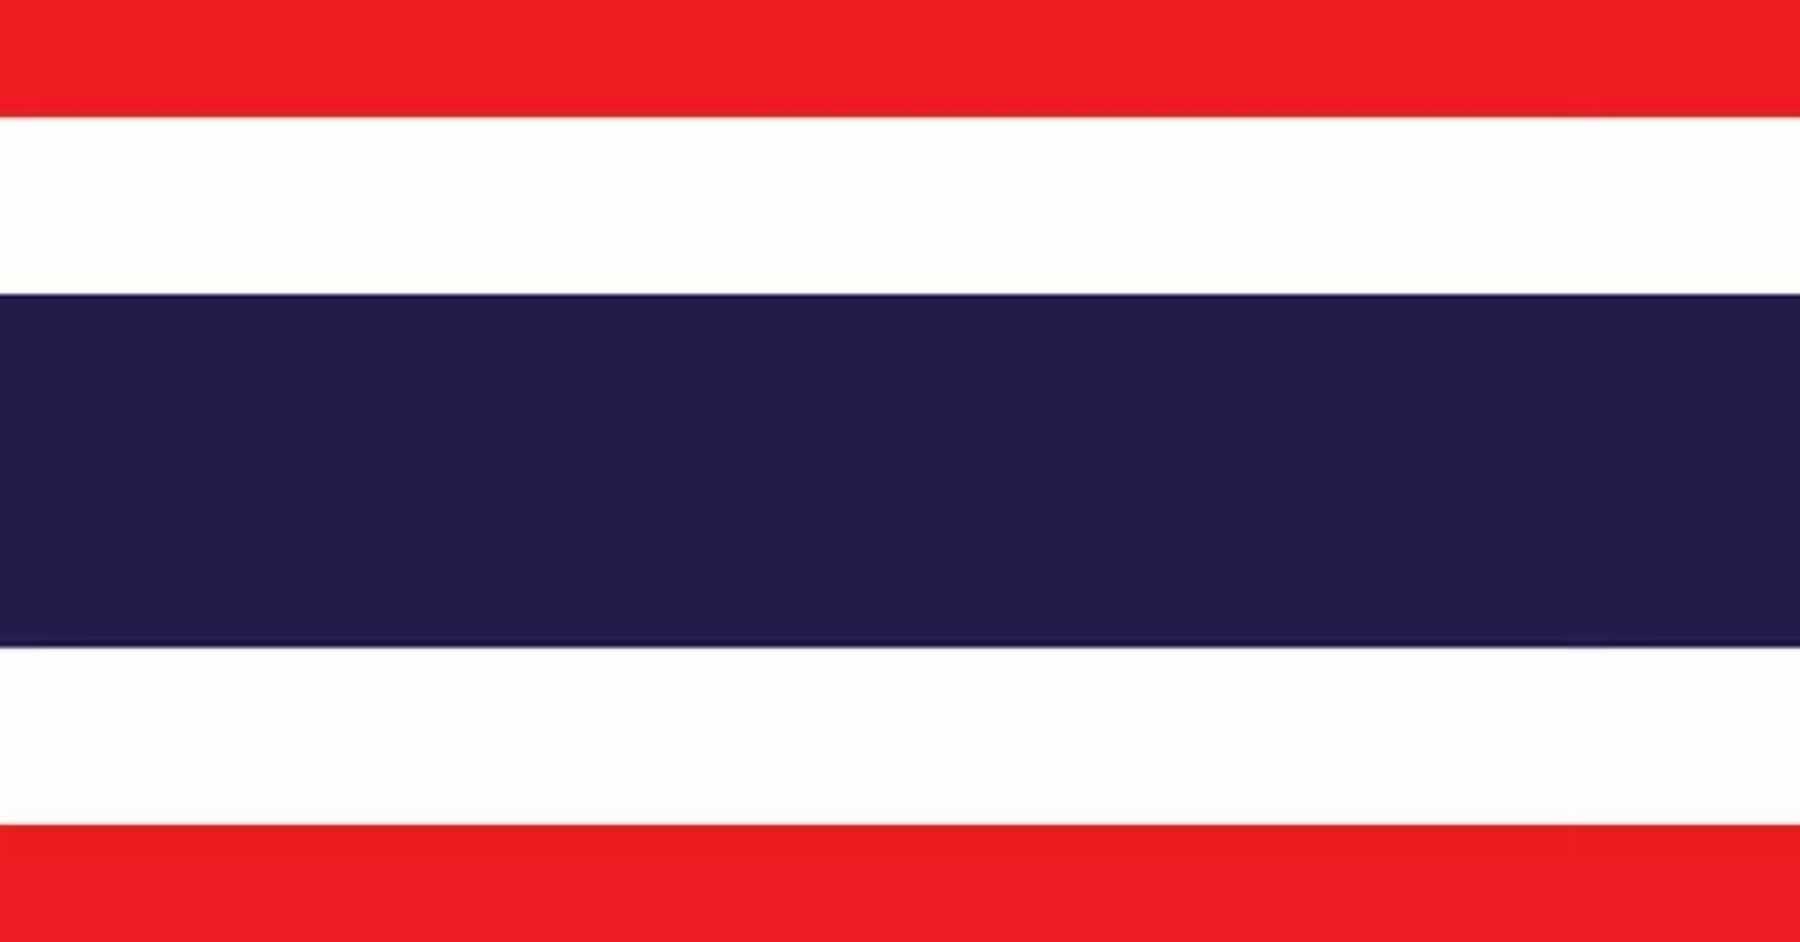 Present Flag of Thailand